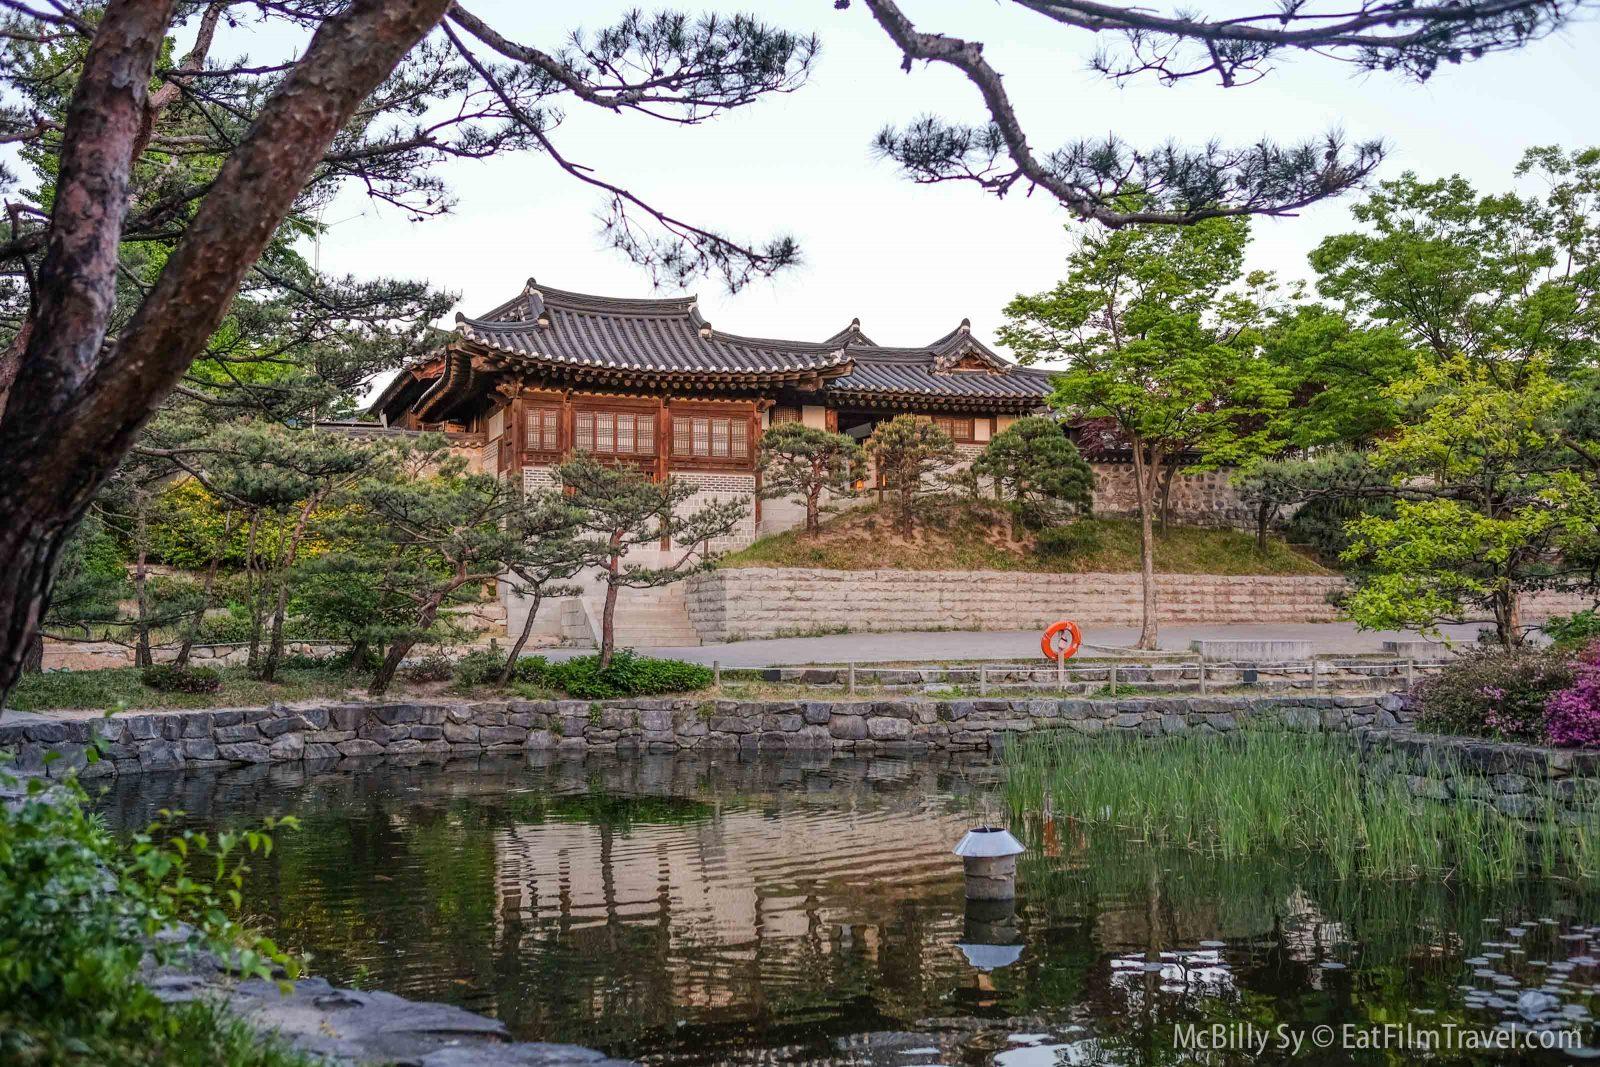 Namsangol Hanok Village in Seoul Korea